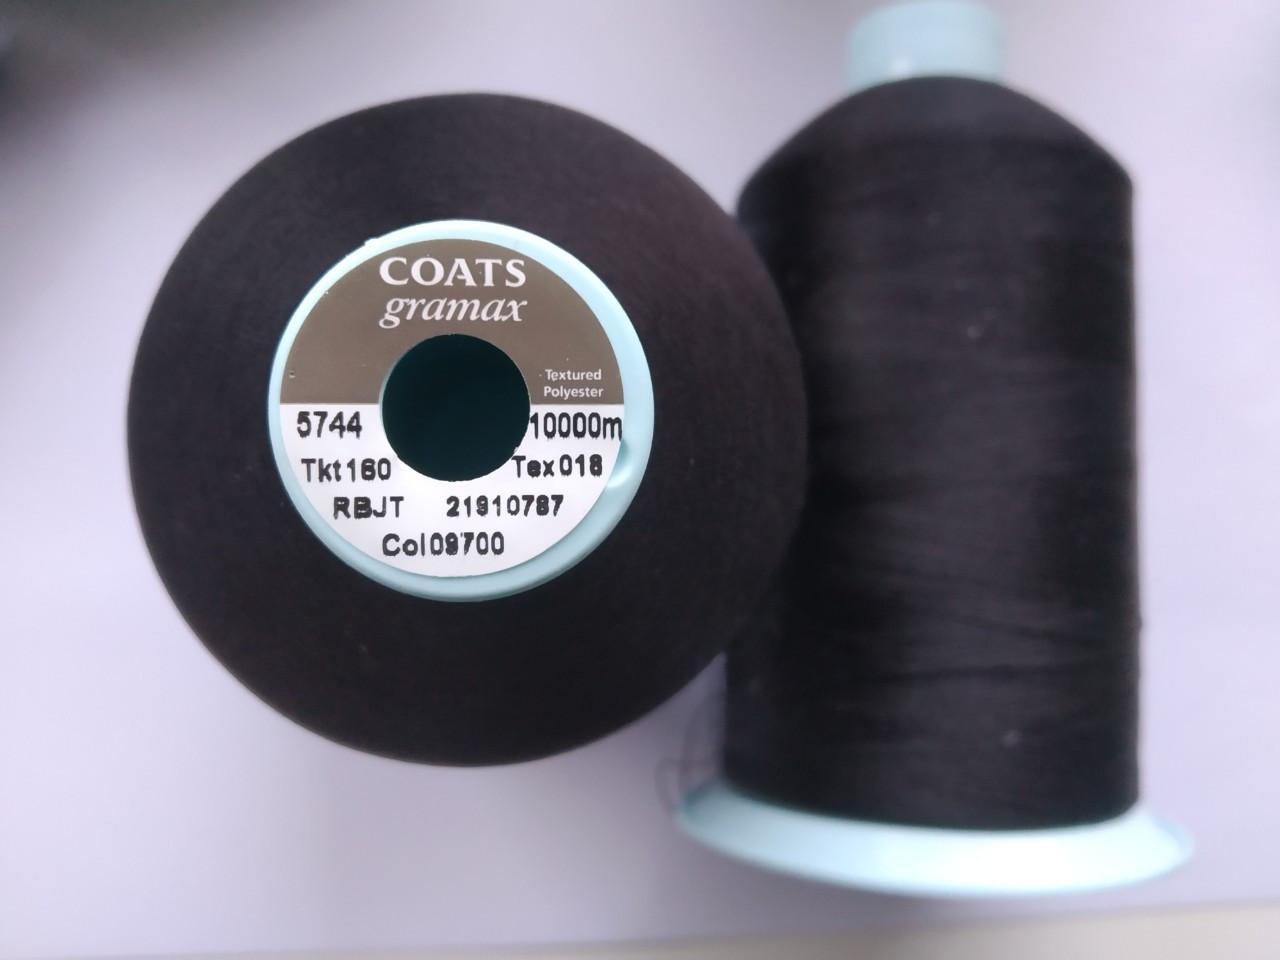 Текстурована нитка Coats gramax 160/ 10000v / 09700 чорний